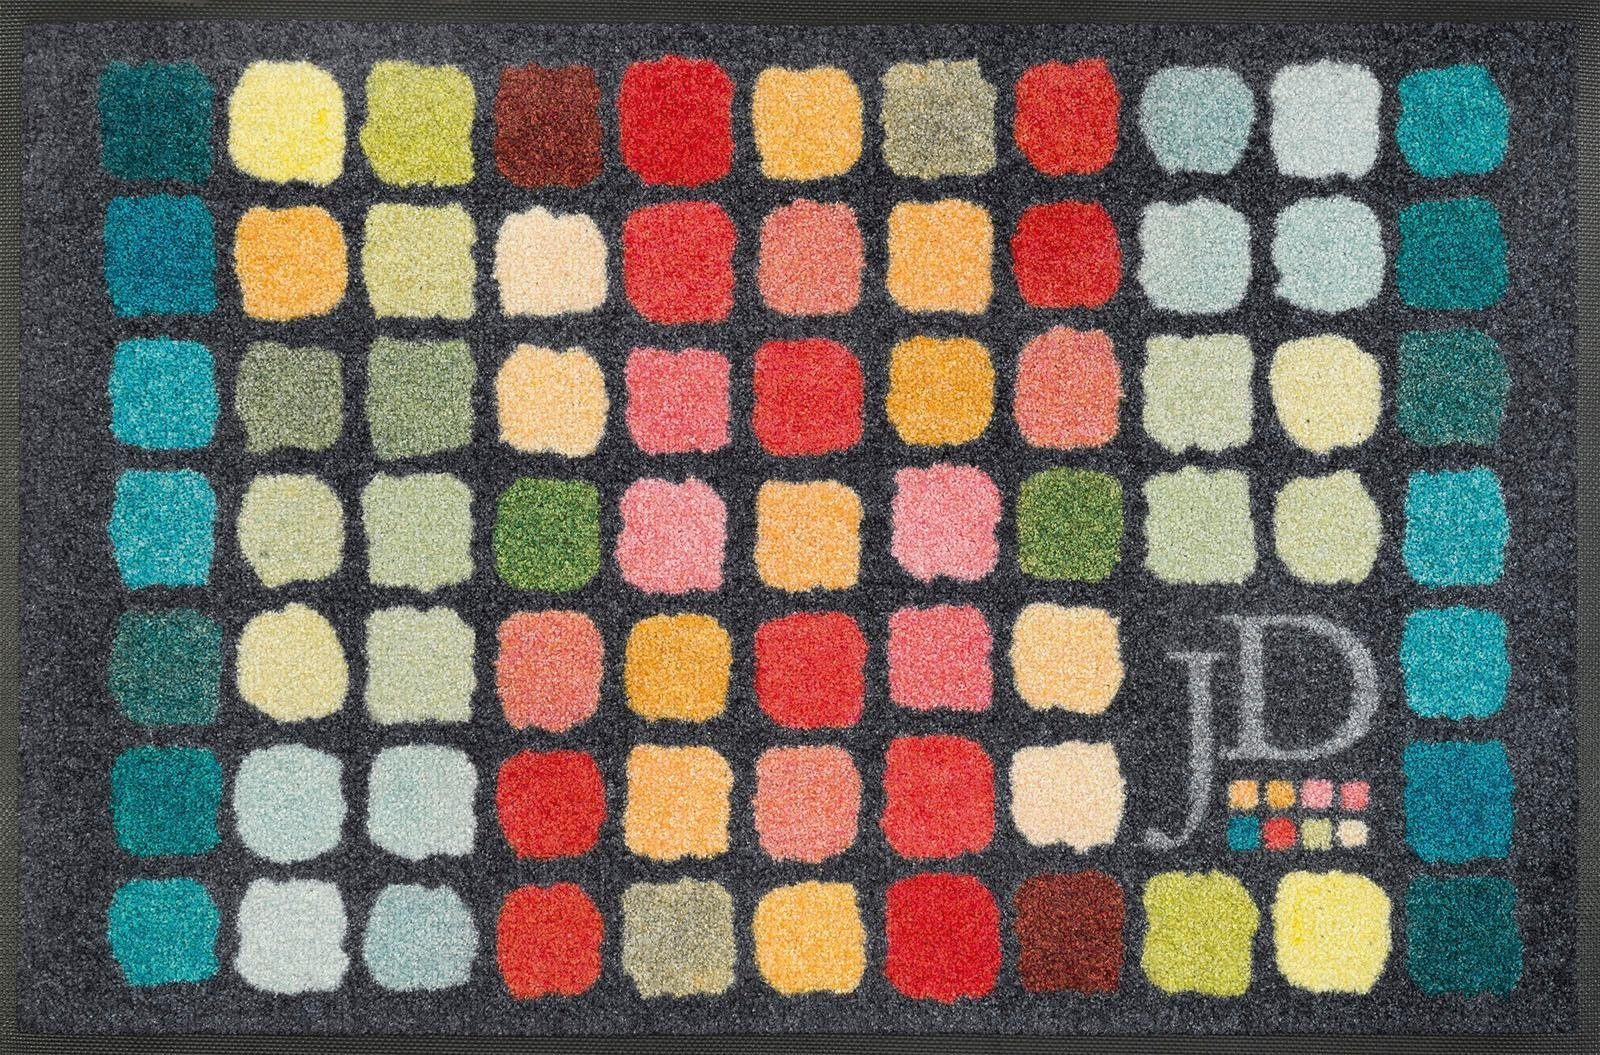 Fußmatte »Colour Palette«, wash+dry by Kleen-Tex, rechteckig, Höhe 7 mm